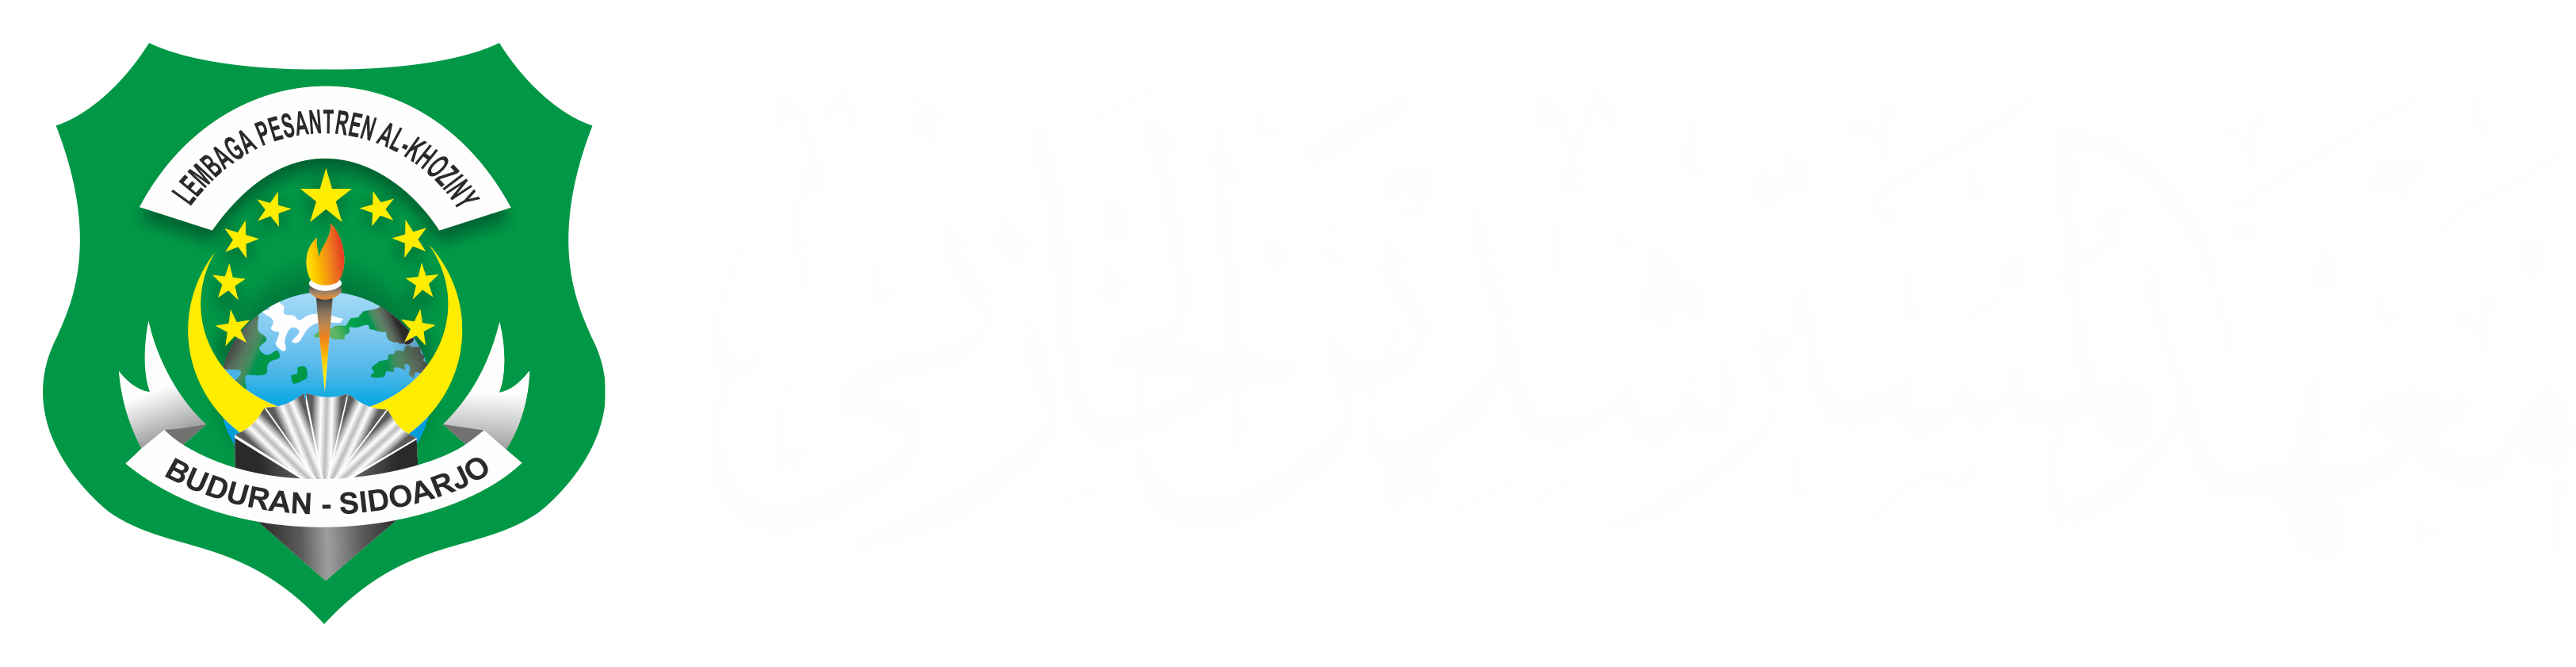 Lembaga Pesantren Al Khoziny